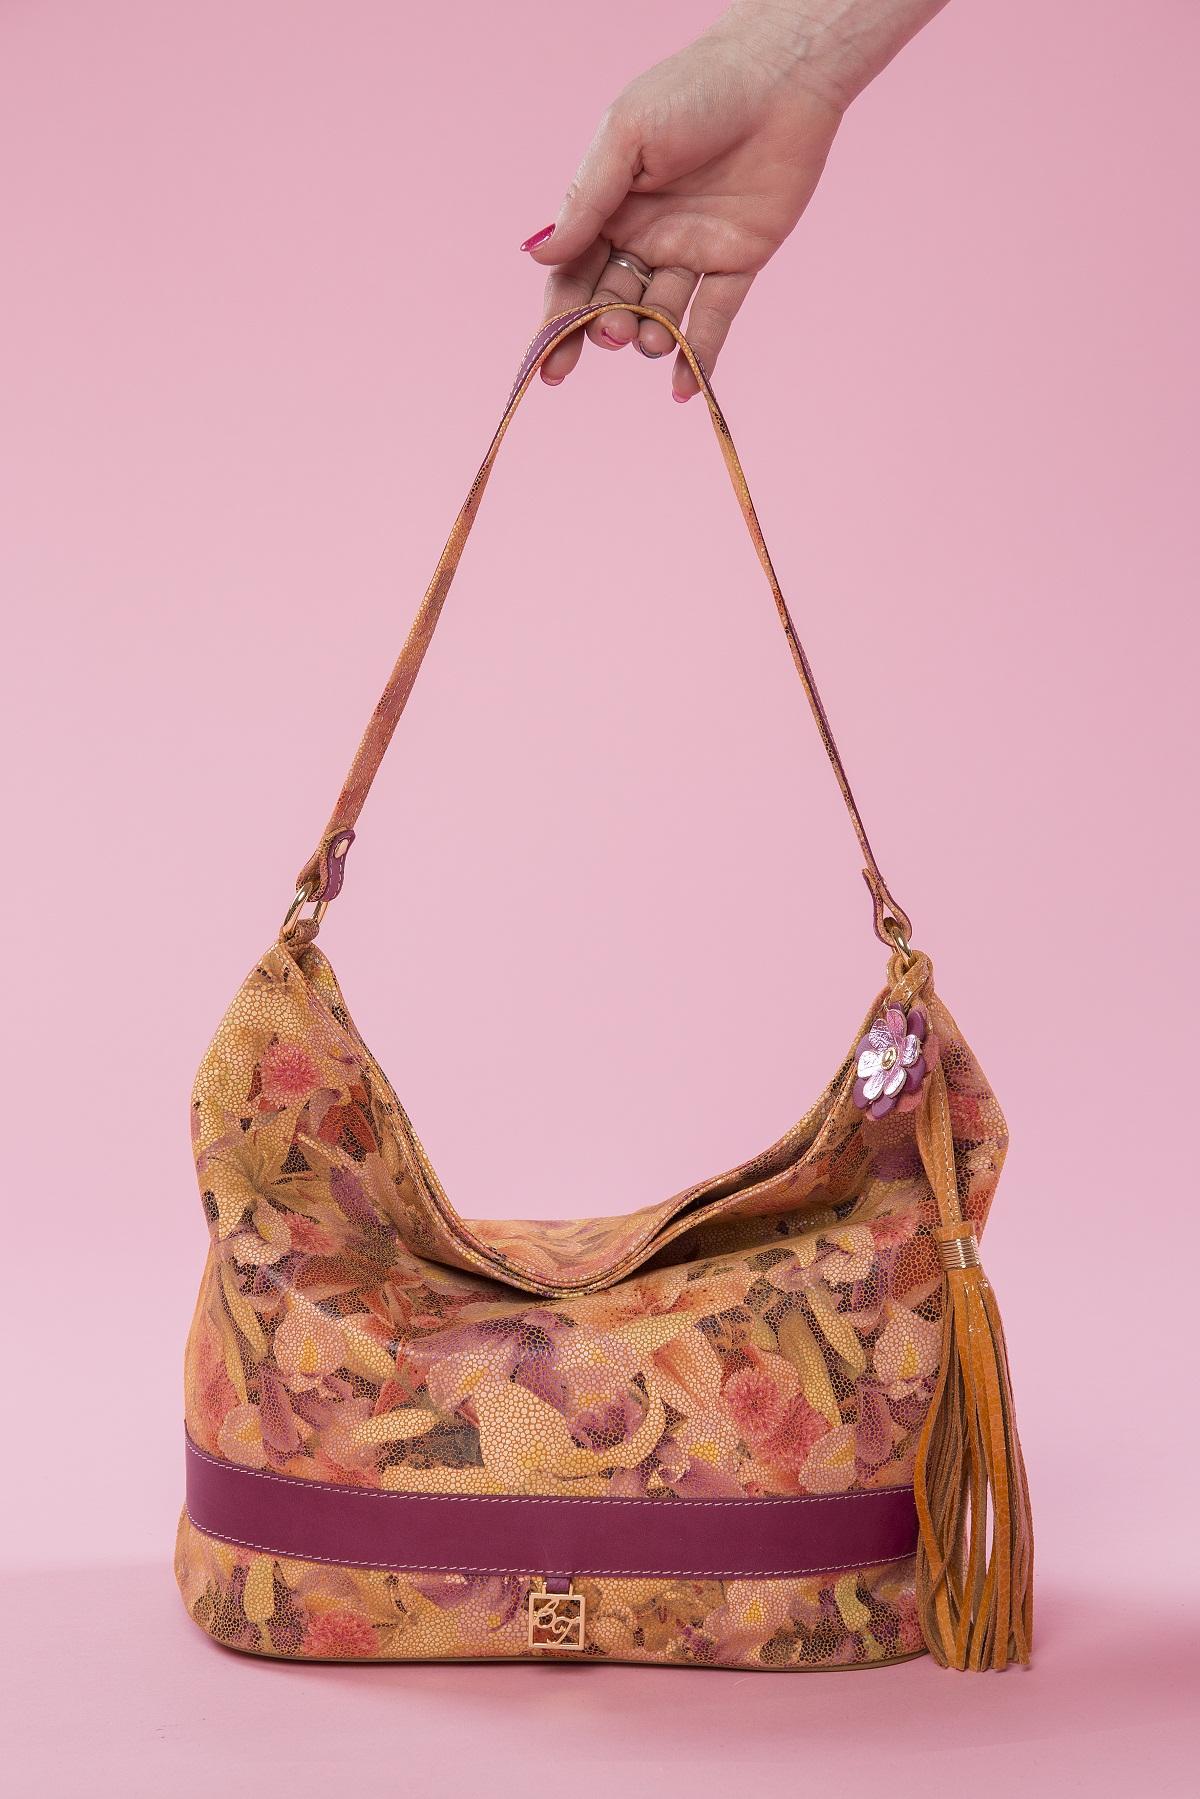 Amaryllis bags